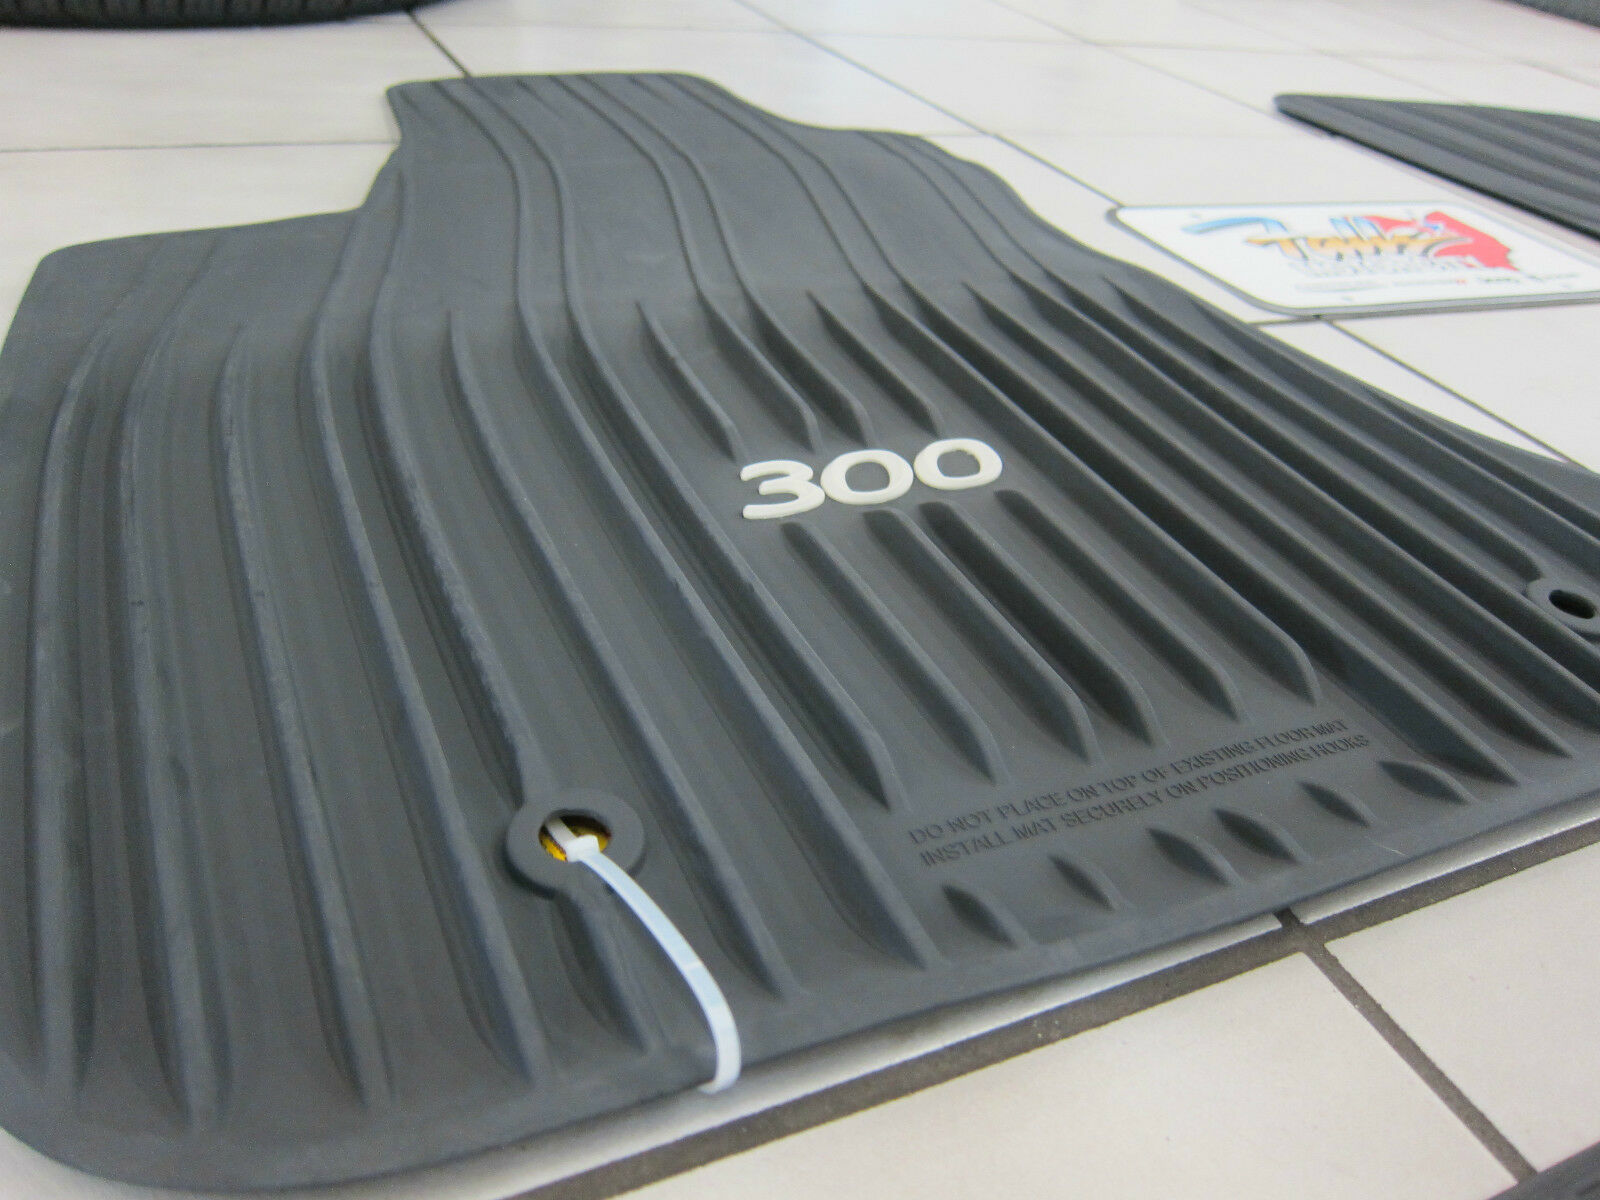 2011 2019 Chrysler 300 Awd All Weather Rubber Slush Mats